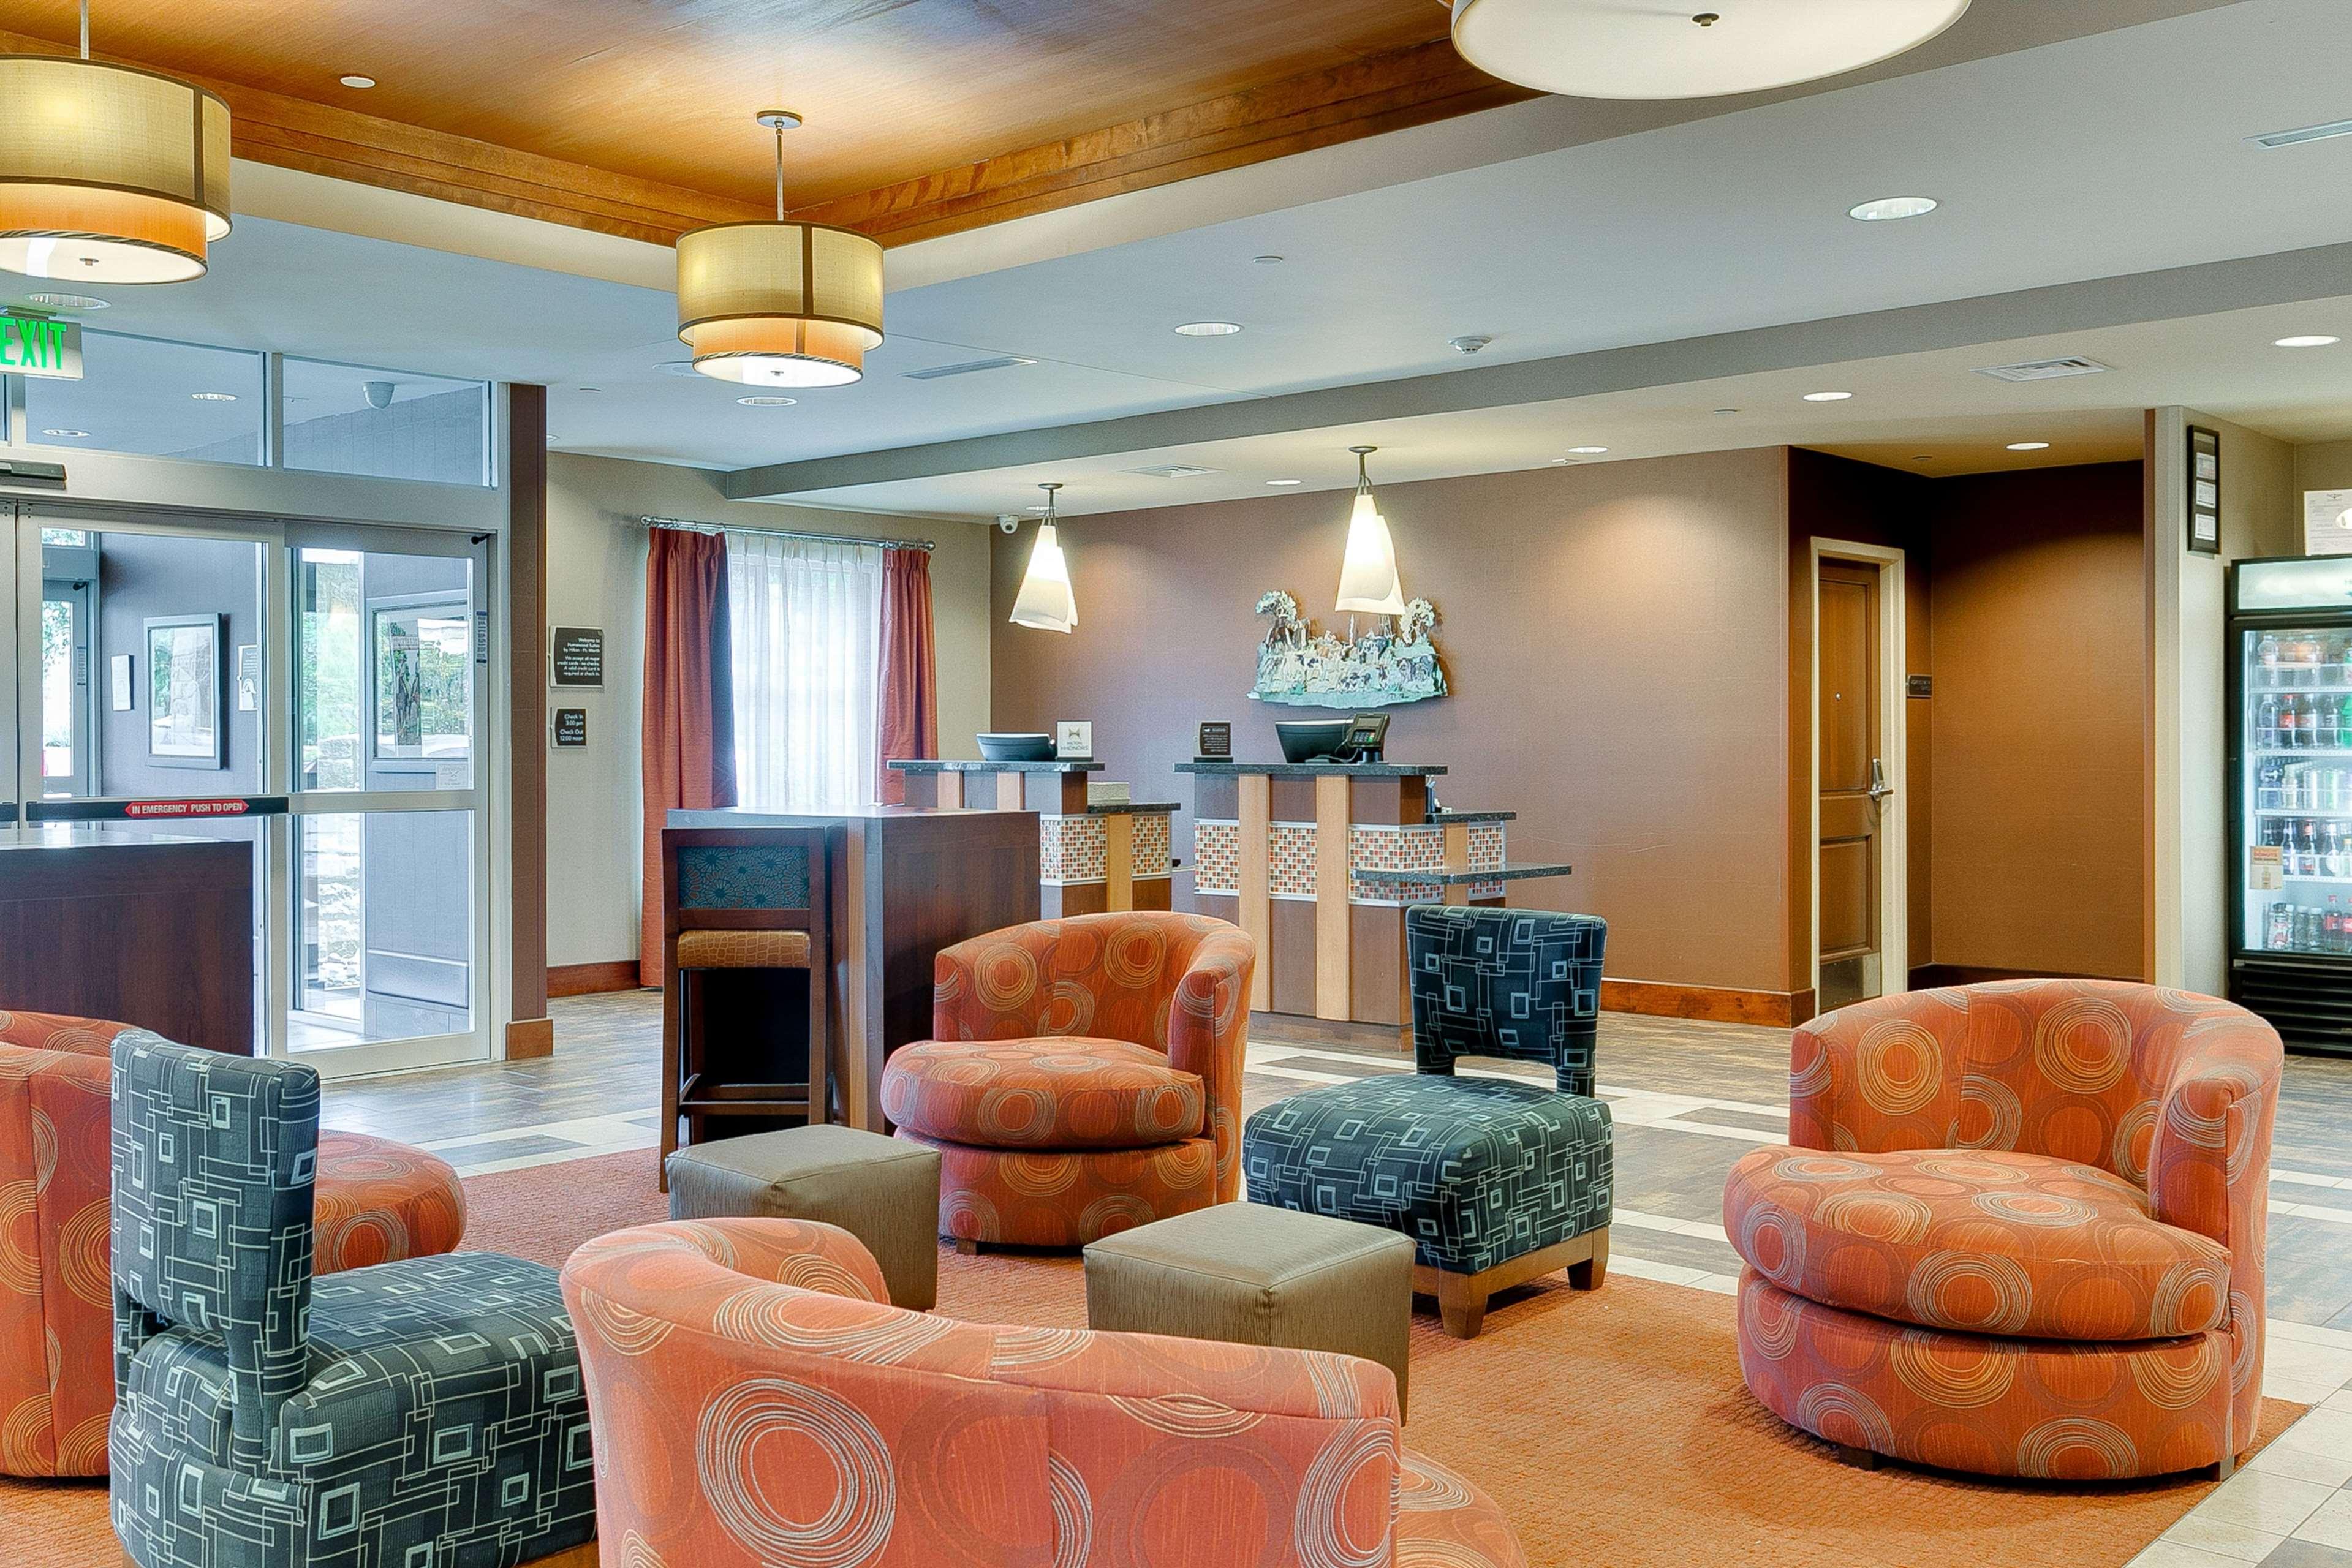 Homewood Suites by Hilton Fort Worth - Medical Center, TX image 3